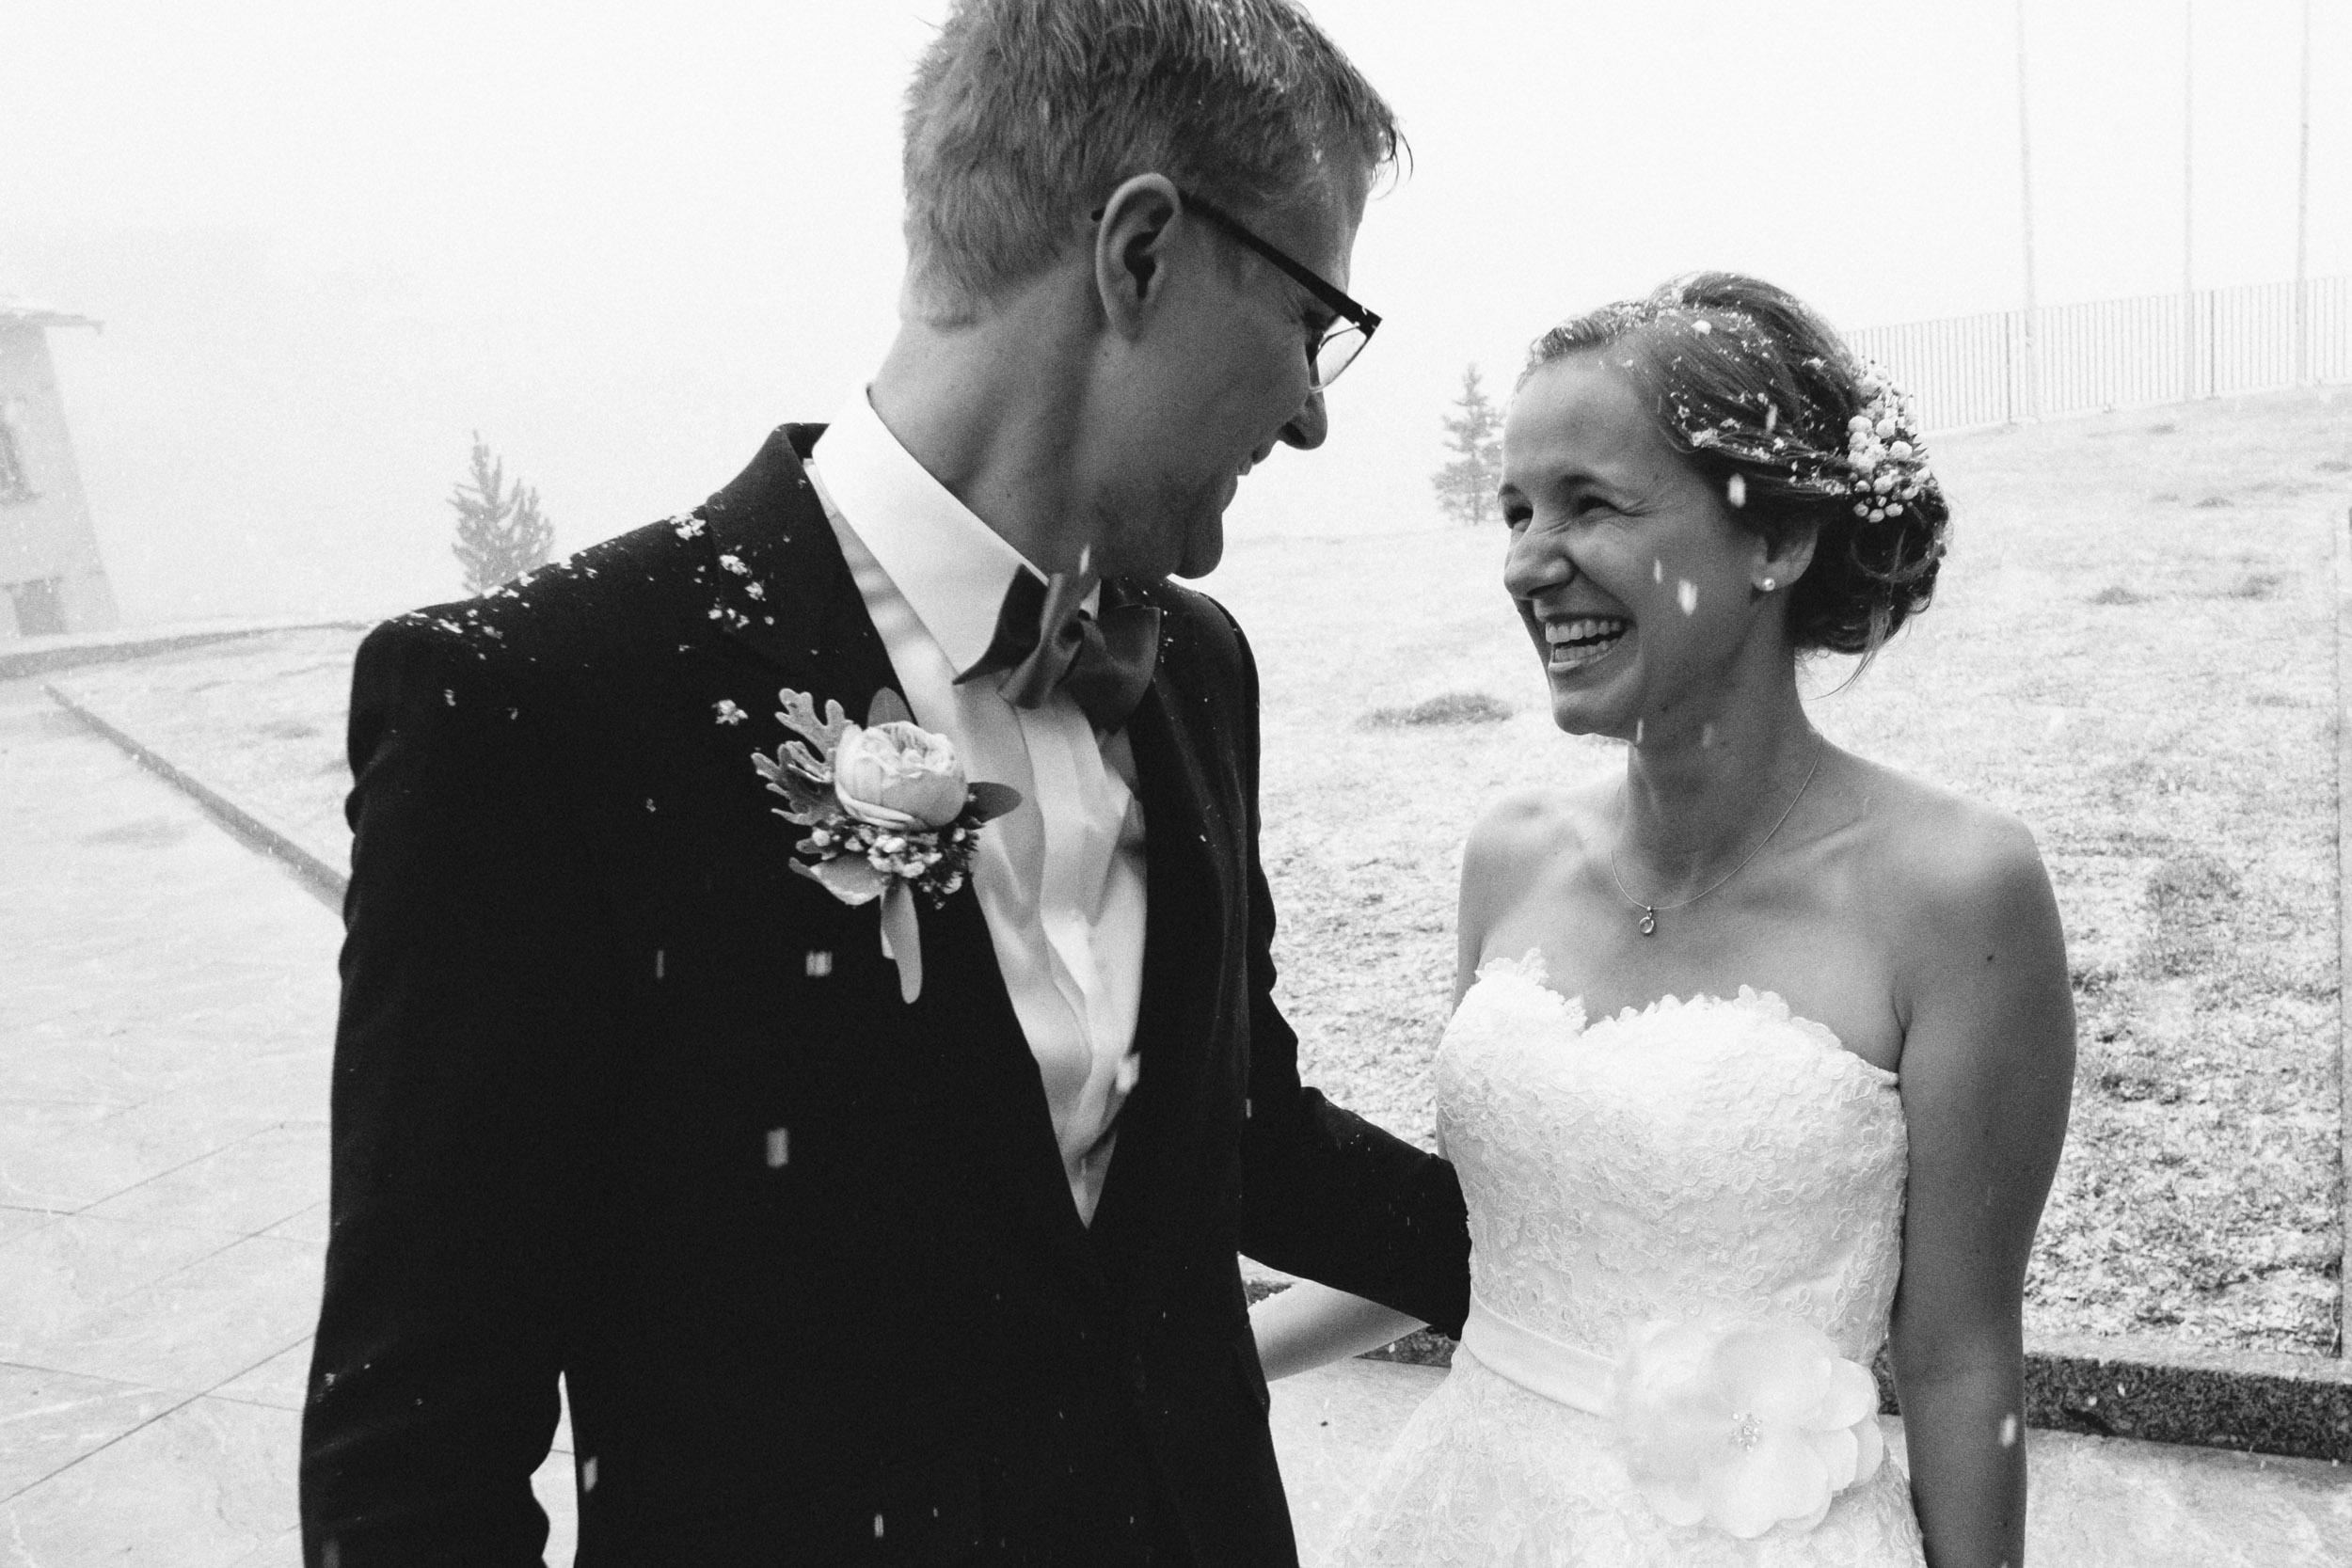 15-jim-parker-wedding-photos.jpg